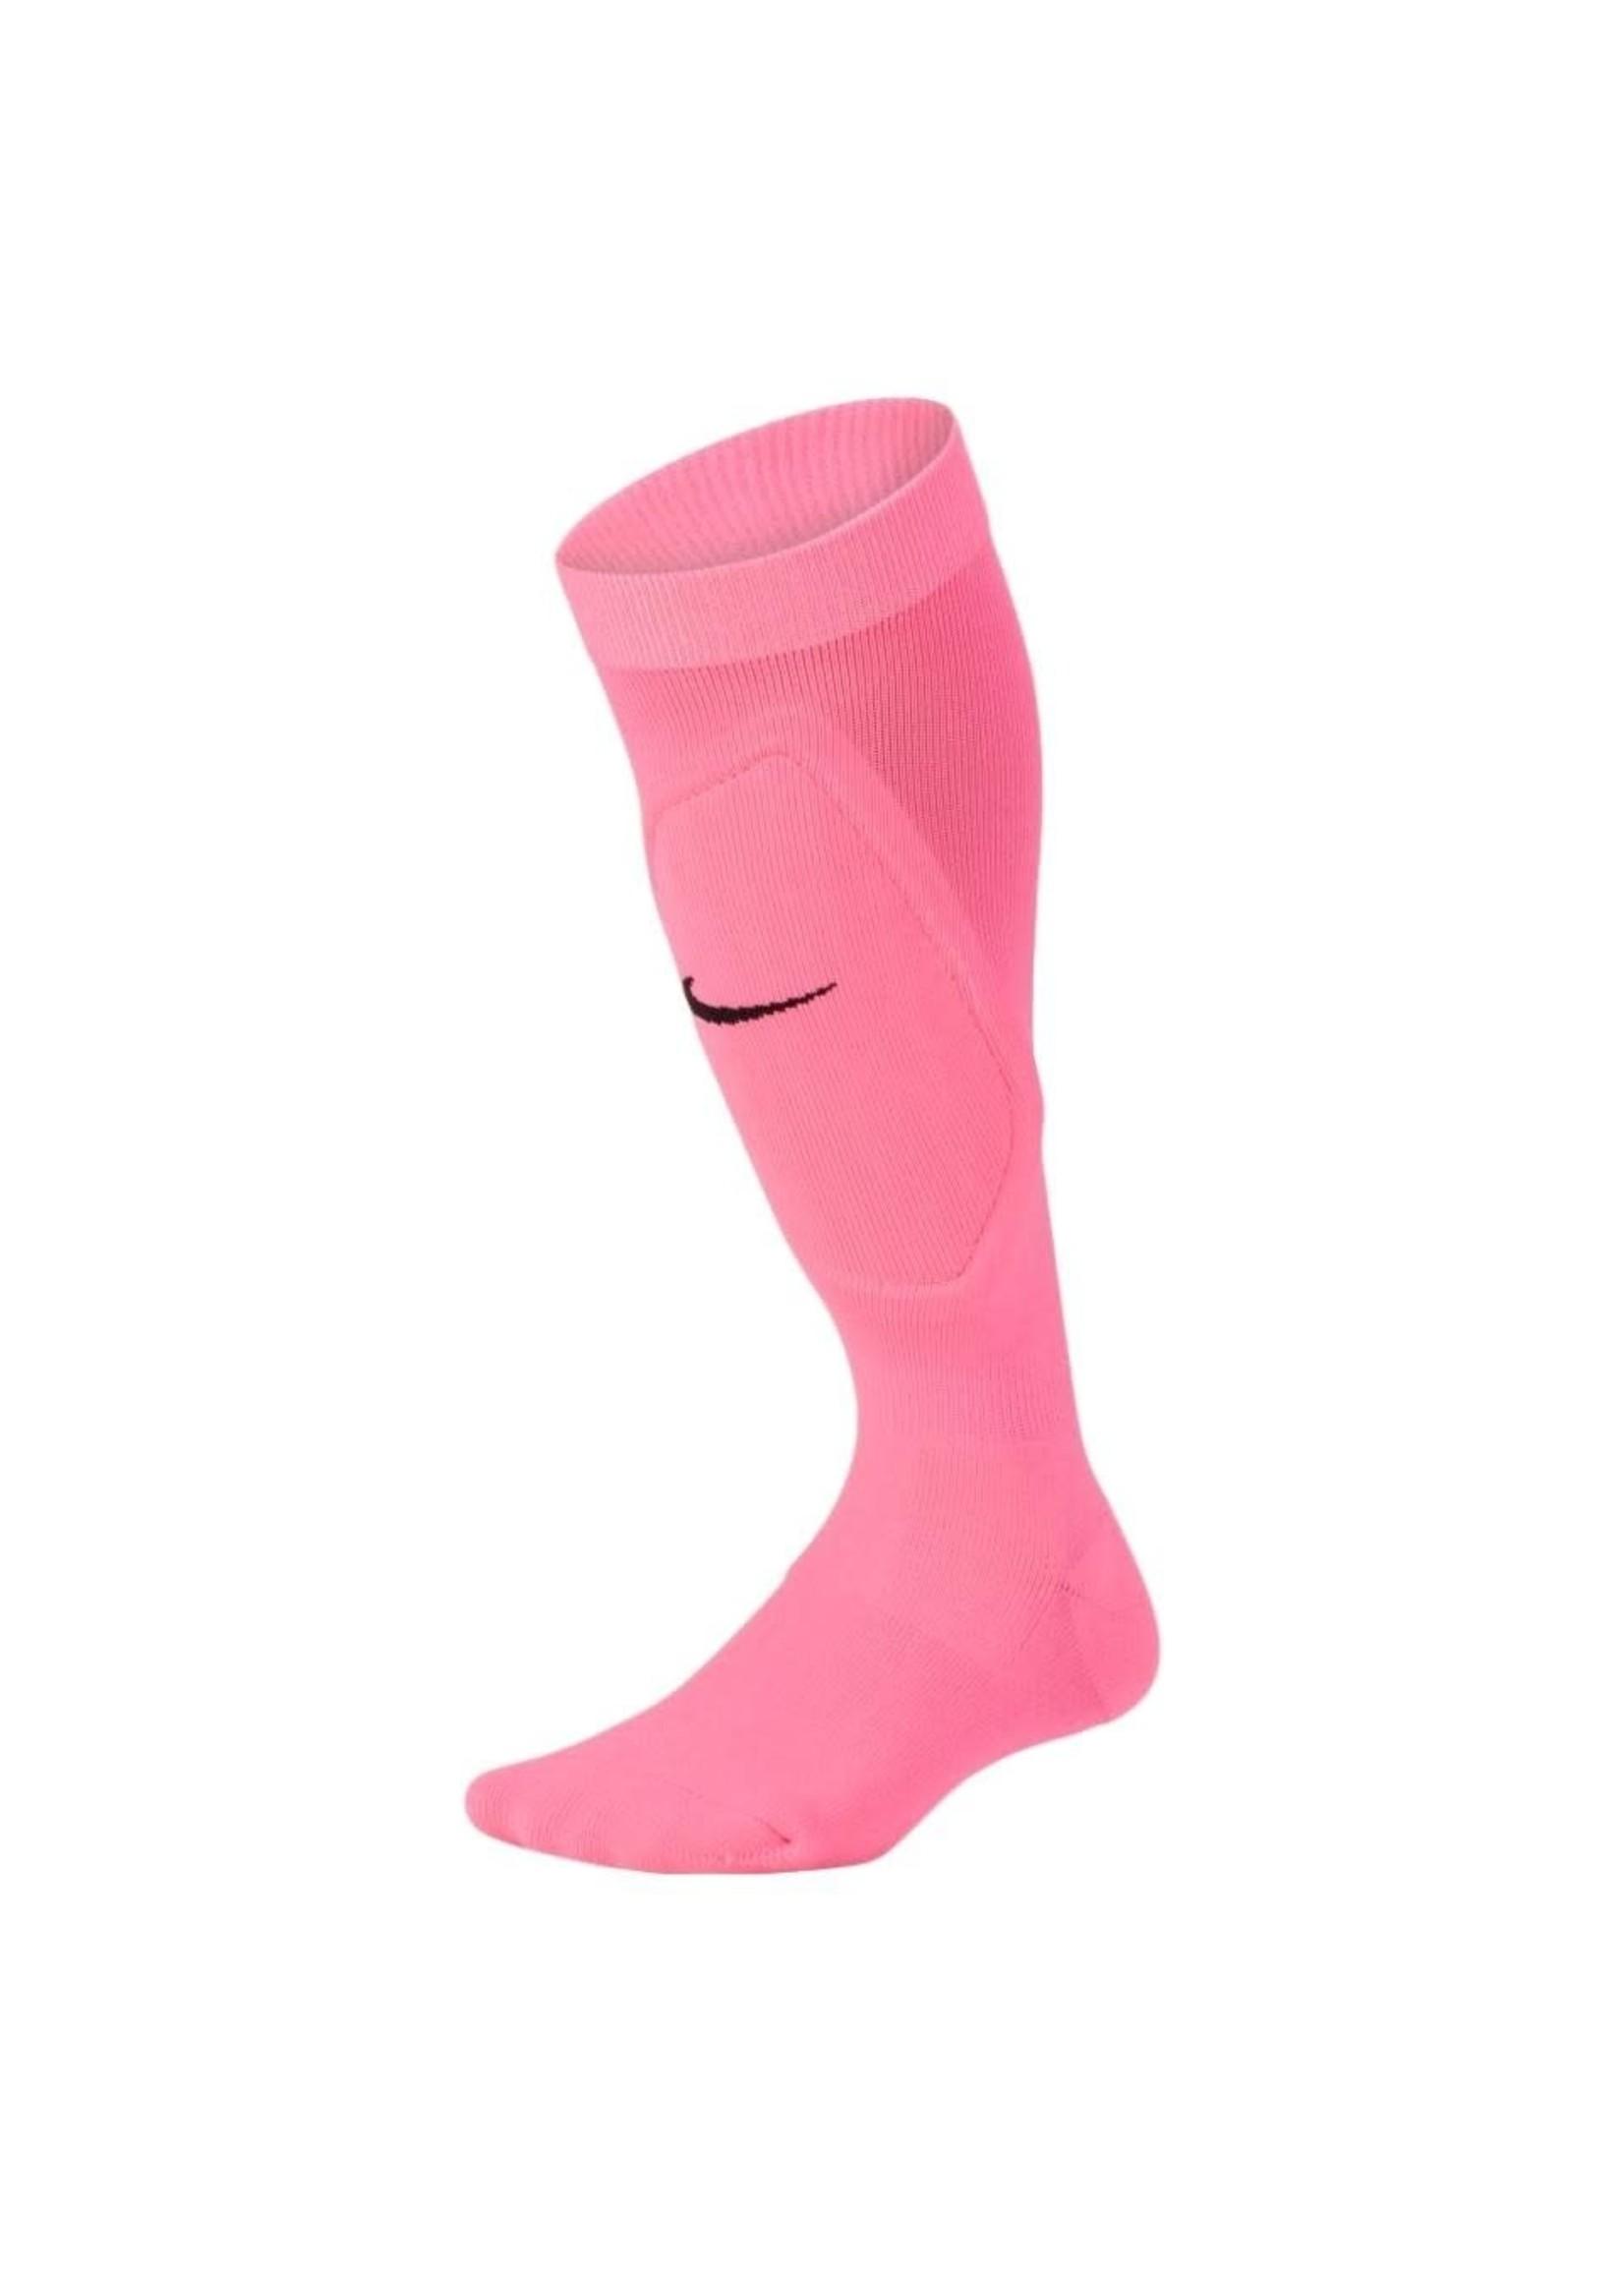 Nike KIDS SHIN SOCKS